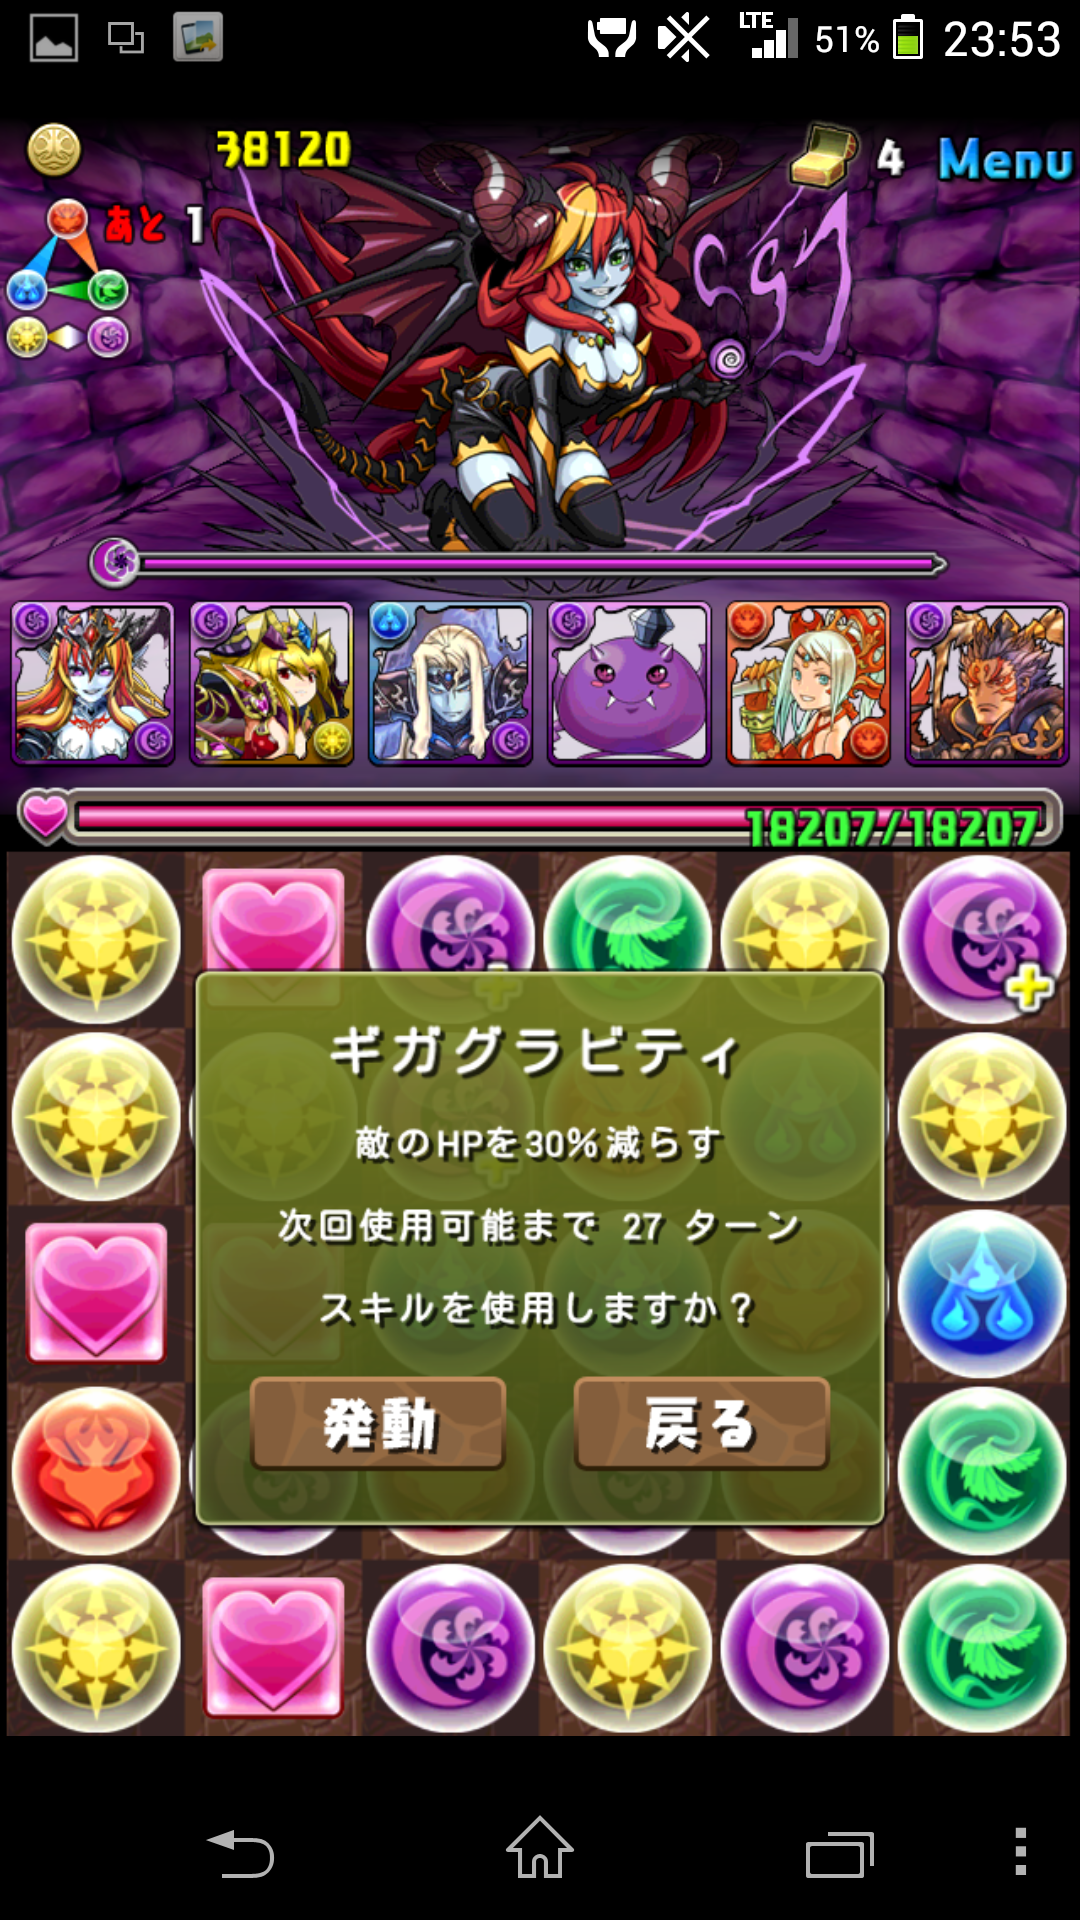 Screenshot_2014-04-17-23-53-44.png